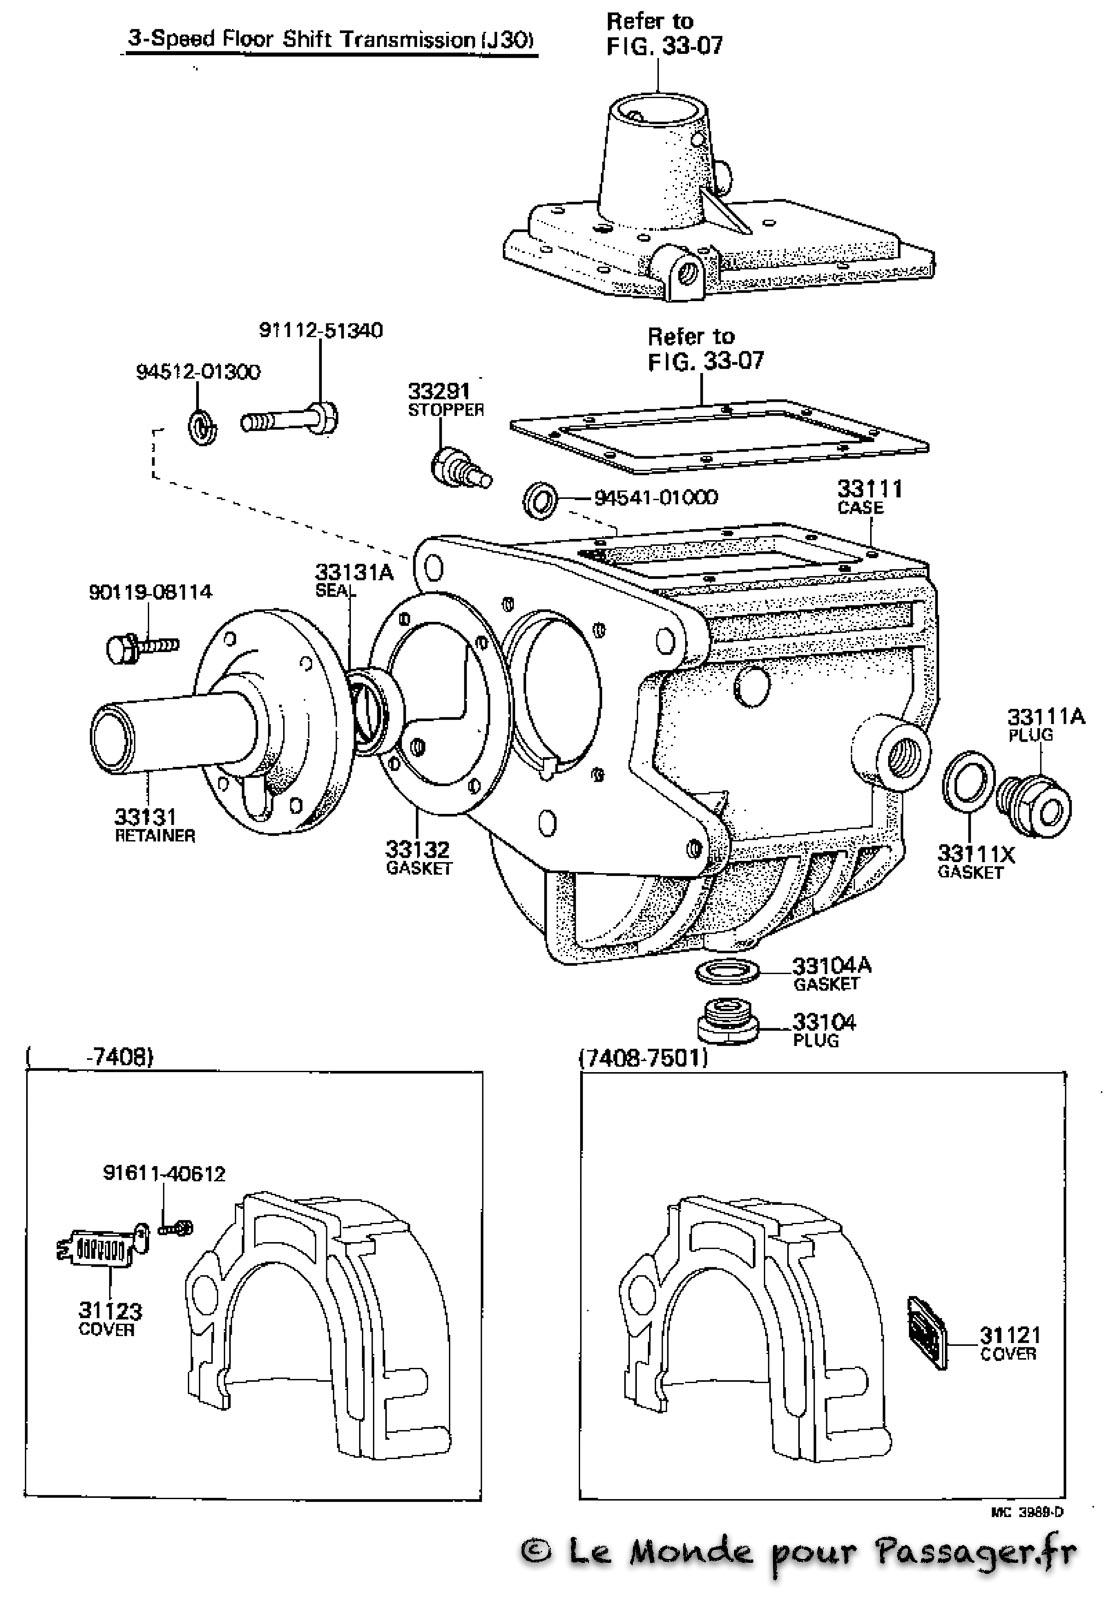 Fj55-Eclatés-Techniques127